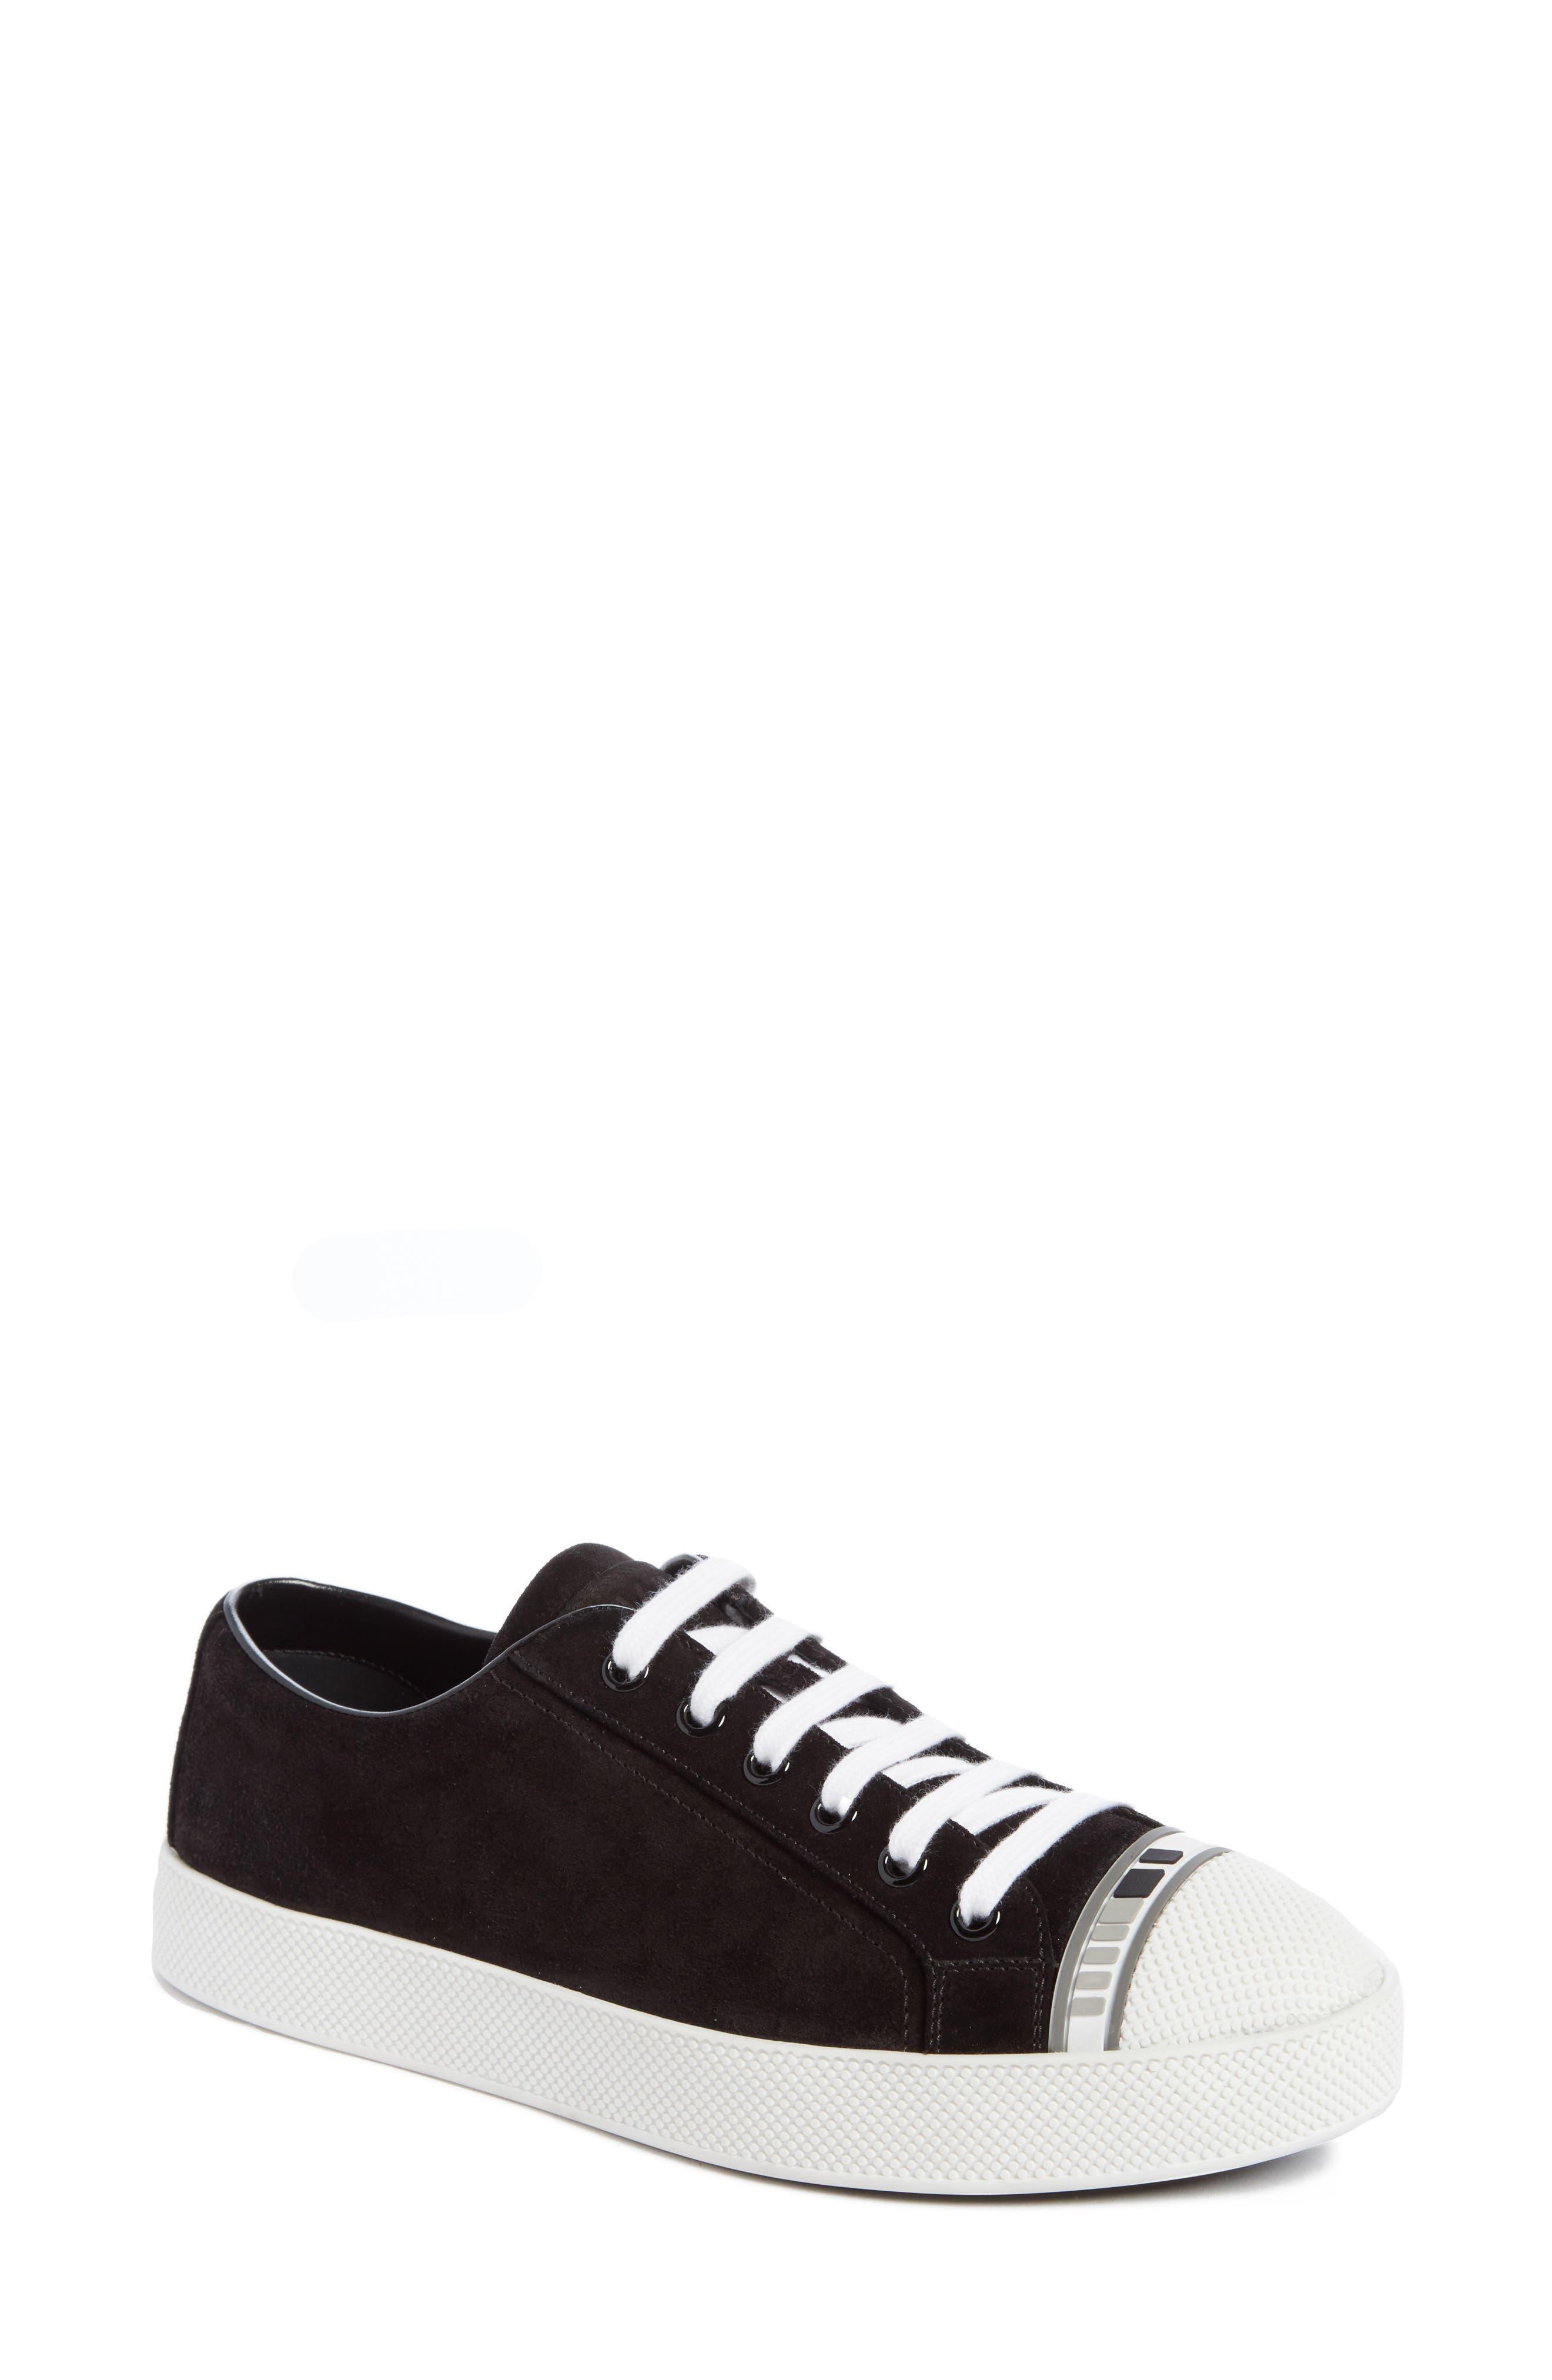 Alternate Image 1 Selected - Prada Linea Rossa Logo Platform Sneaker (Women)